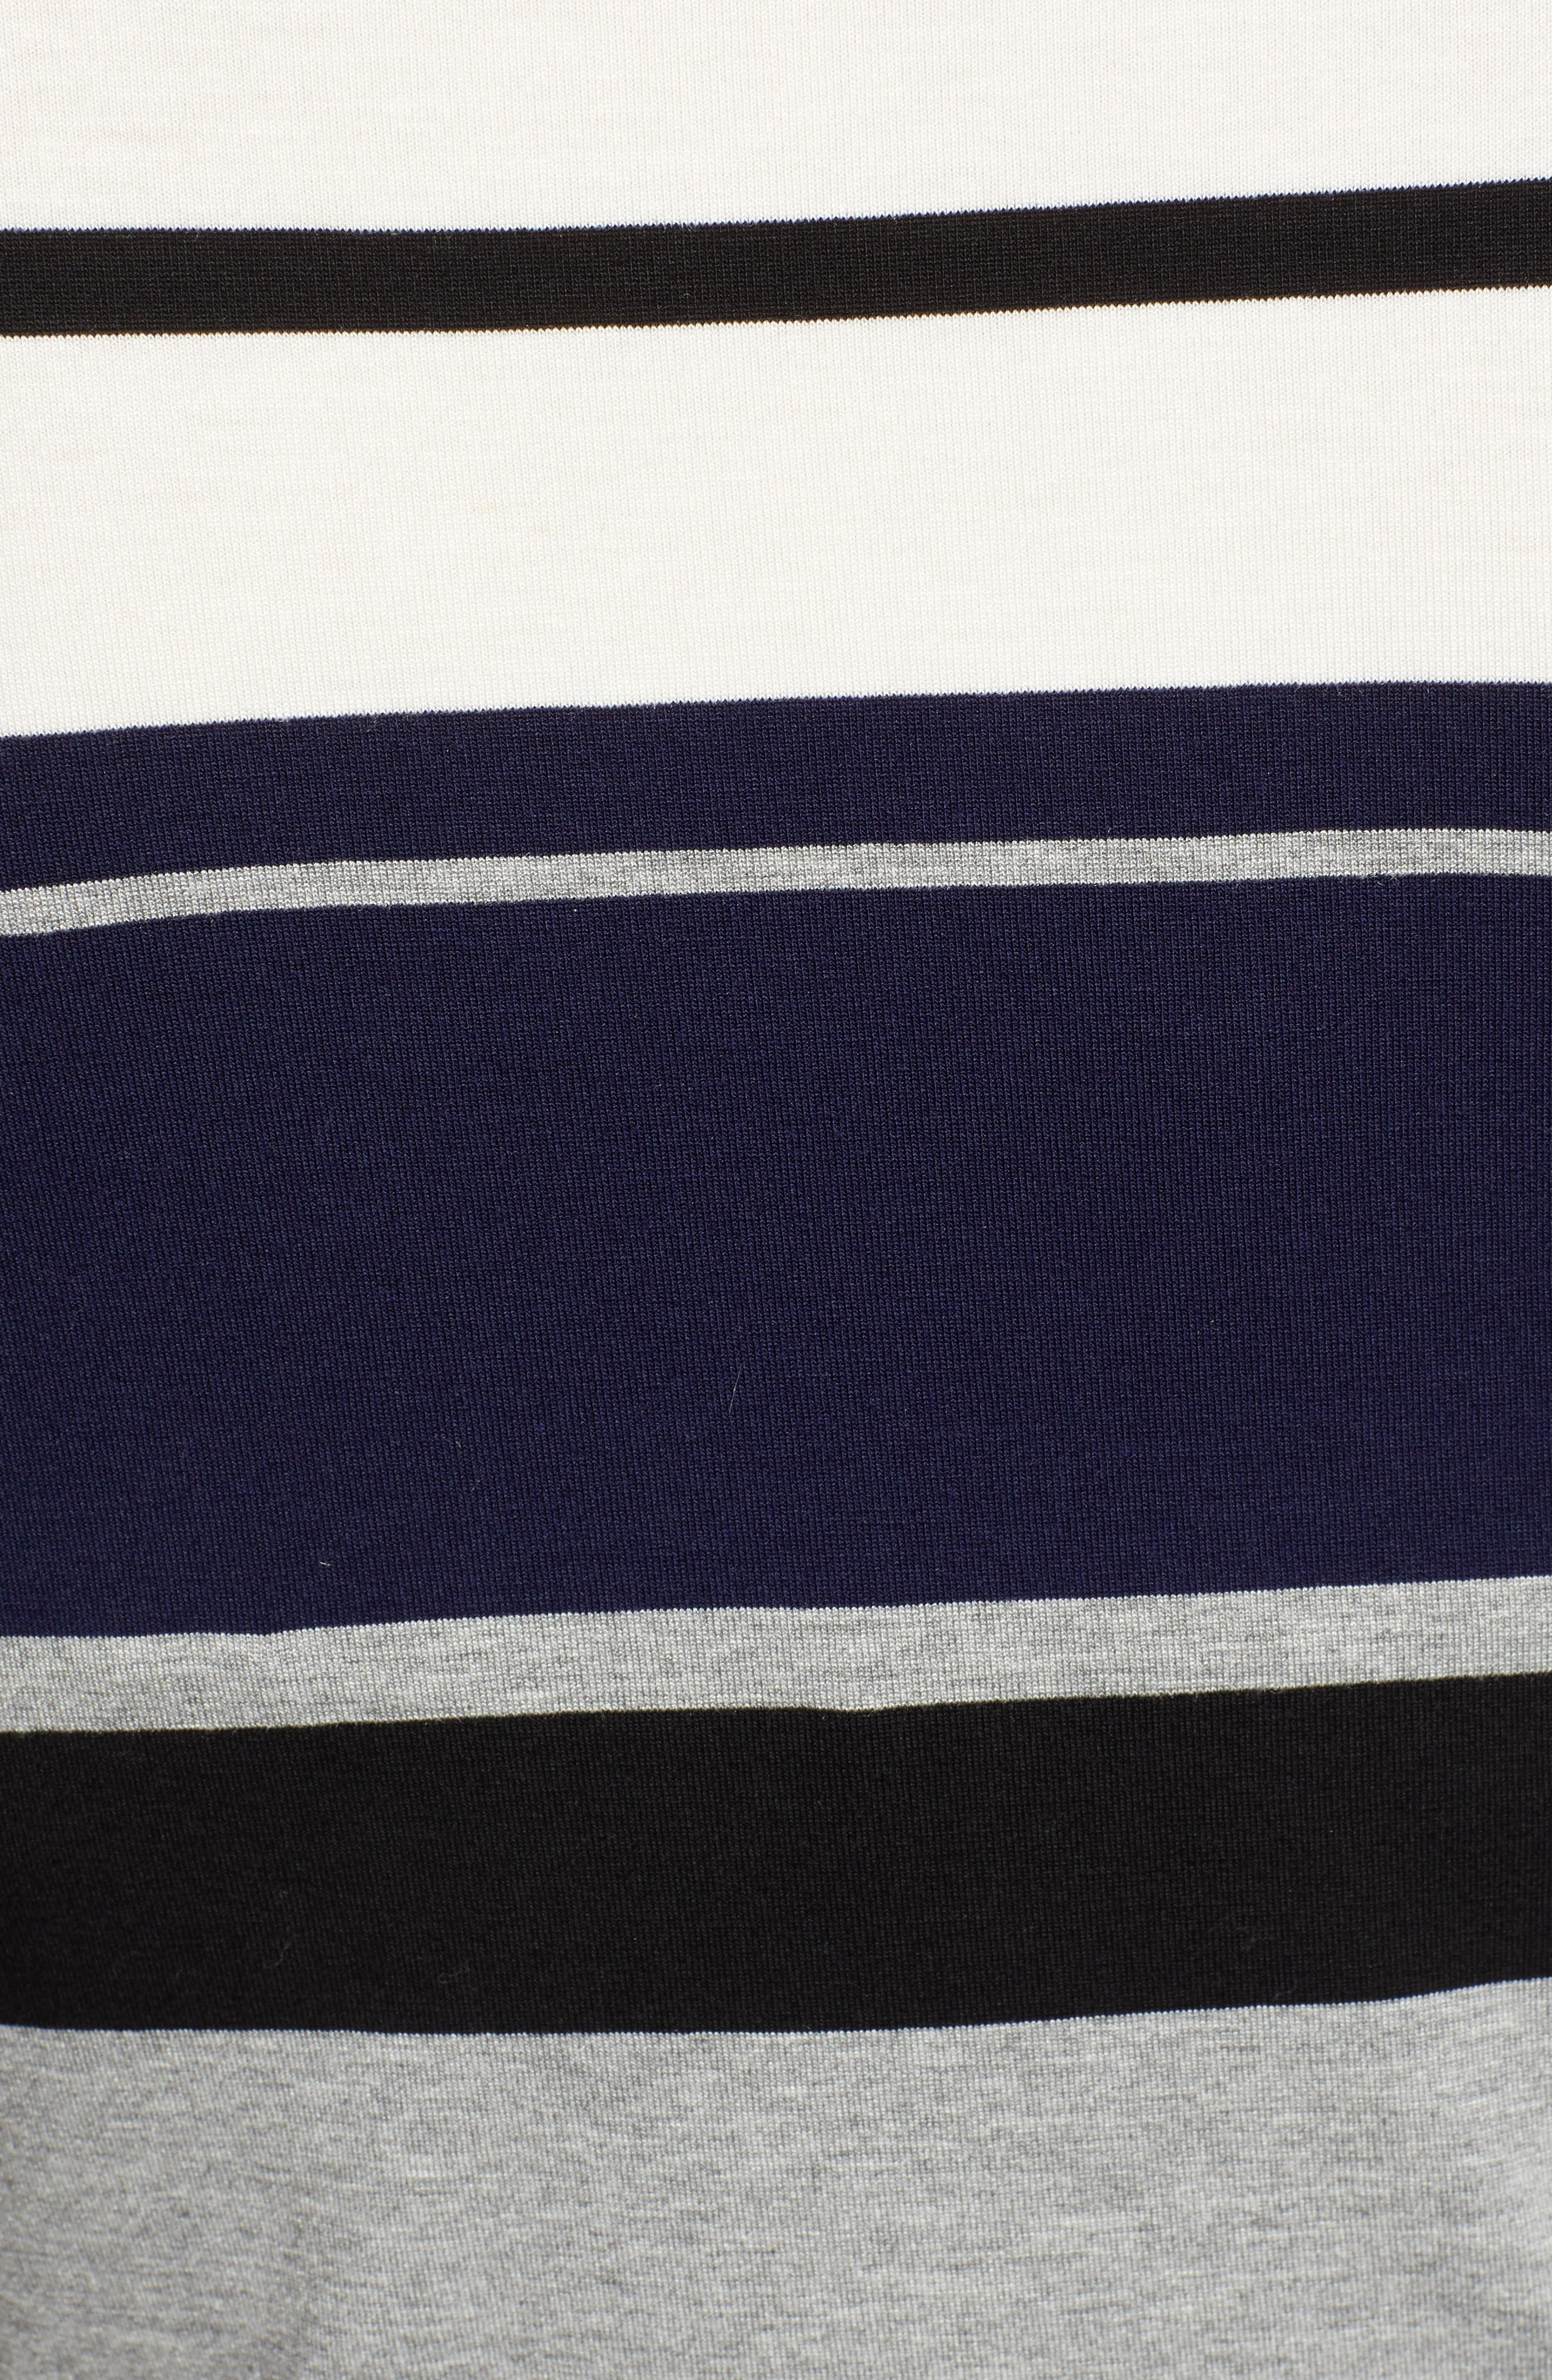 Stripe Mock Neck Tee,                             Alternate thumbnail 5, color,                             BLACK/ WHITE/ GREY